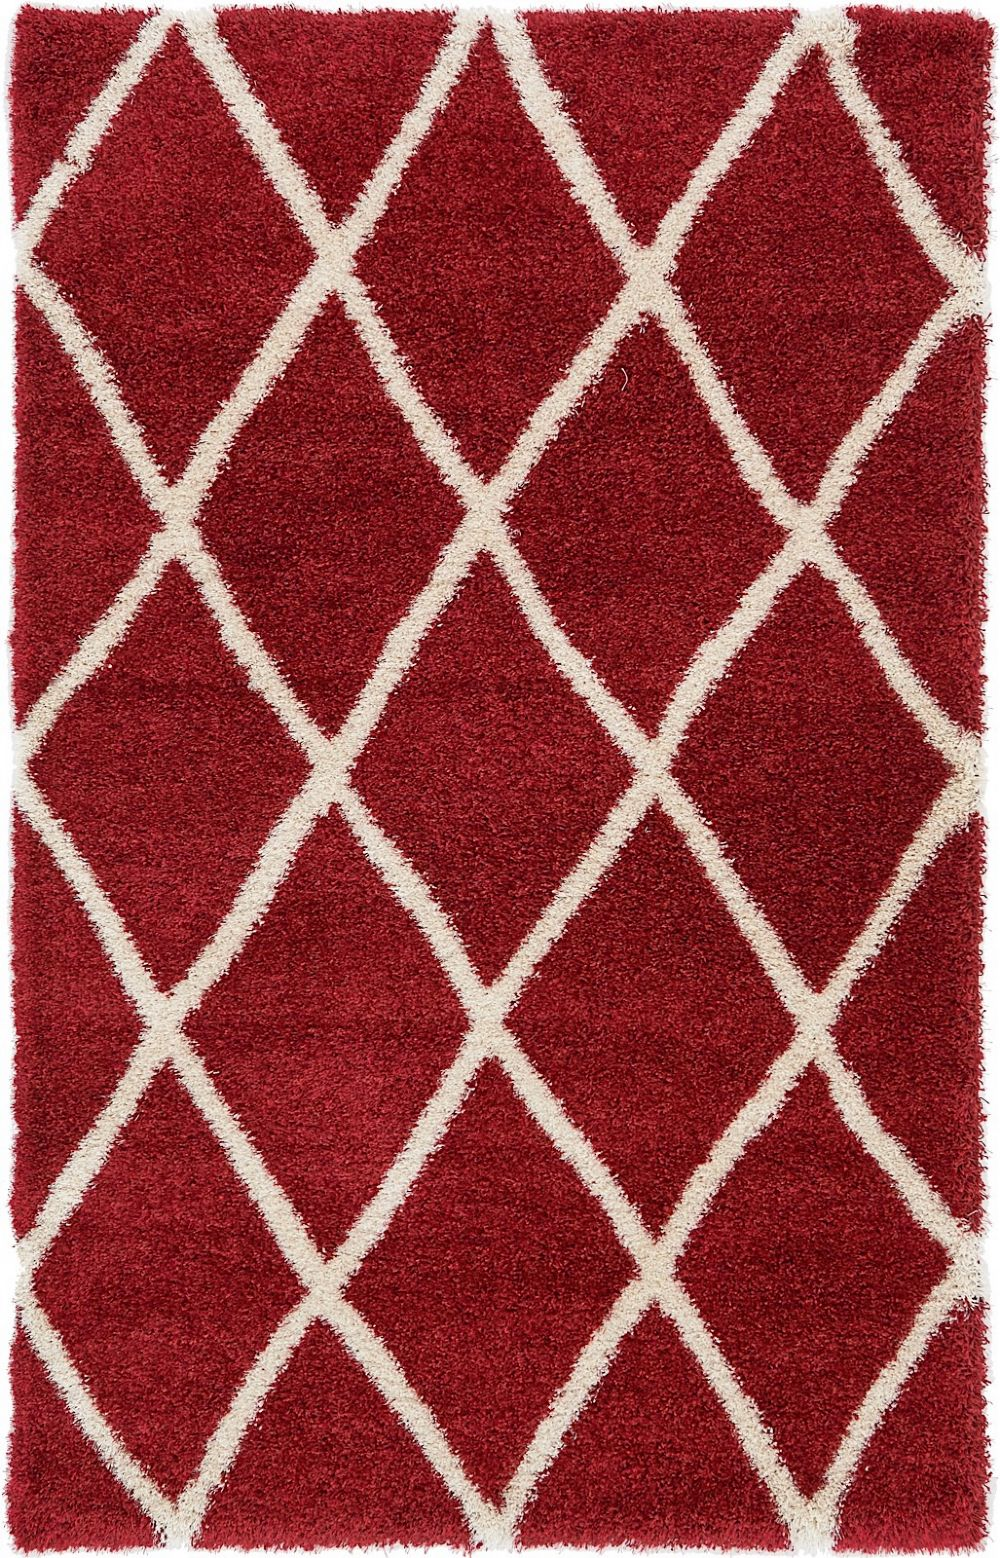 rugpal lavish shag shag area rug collection